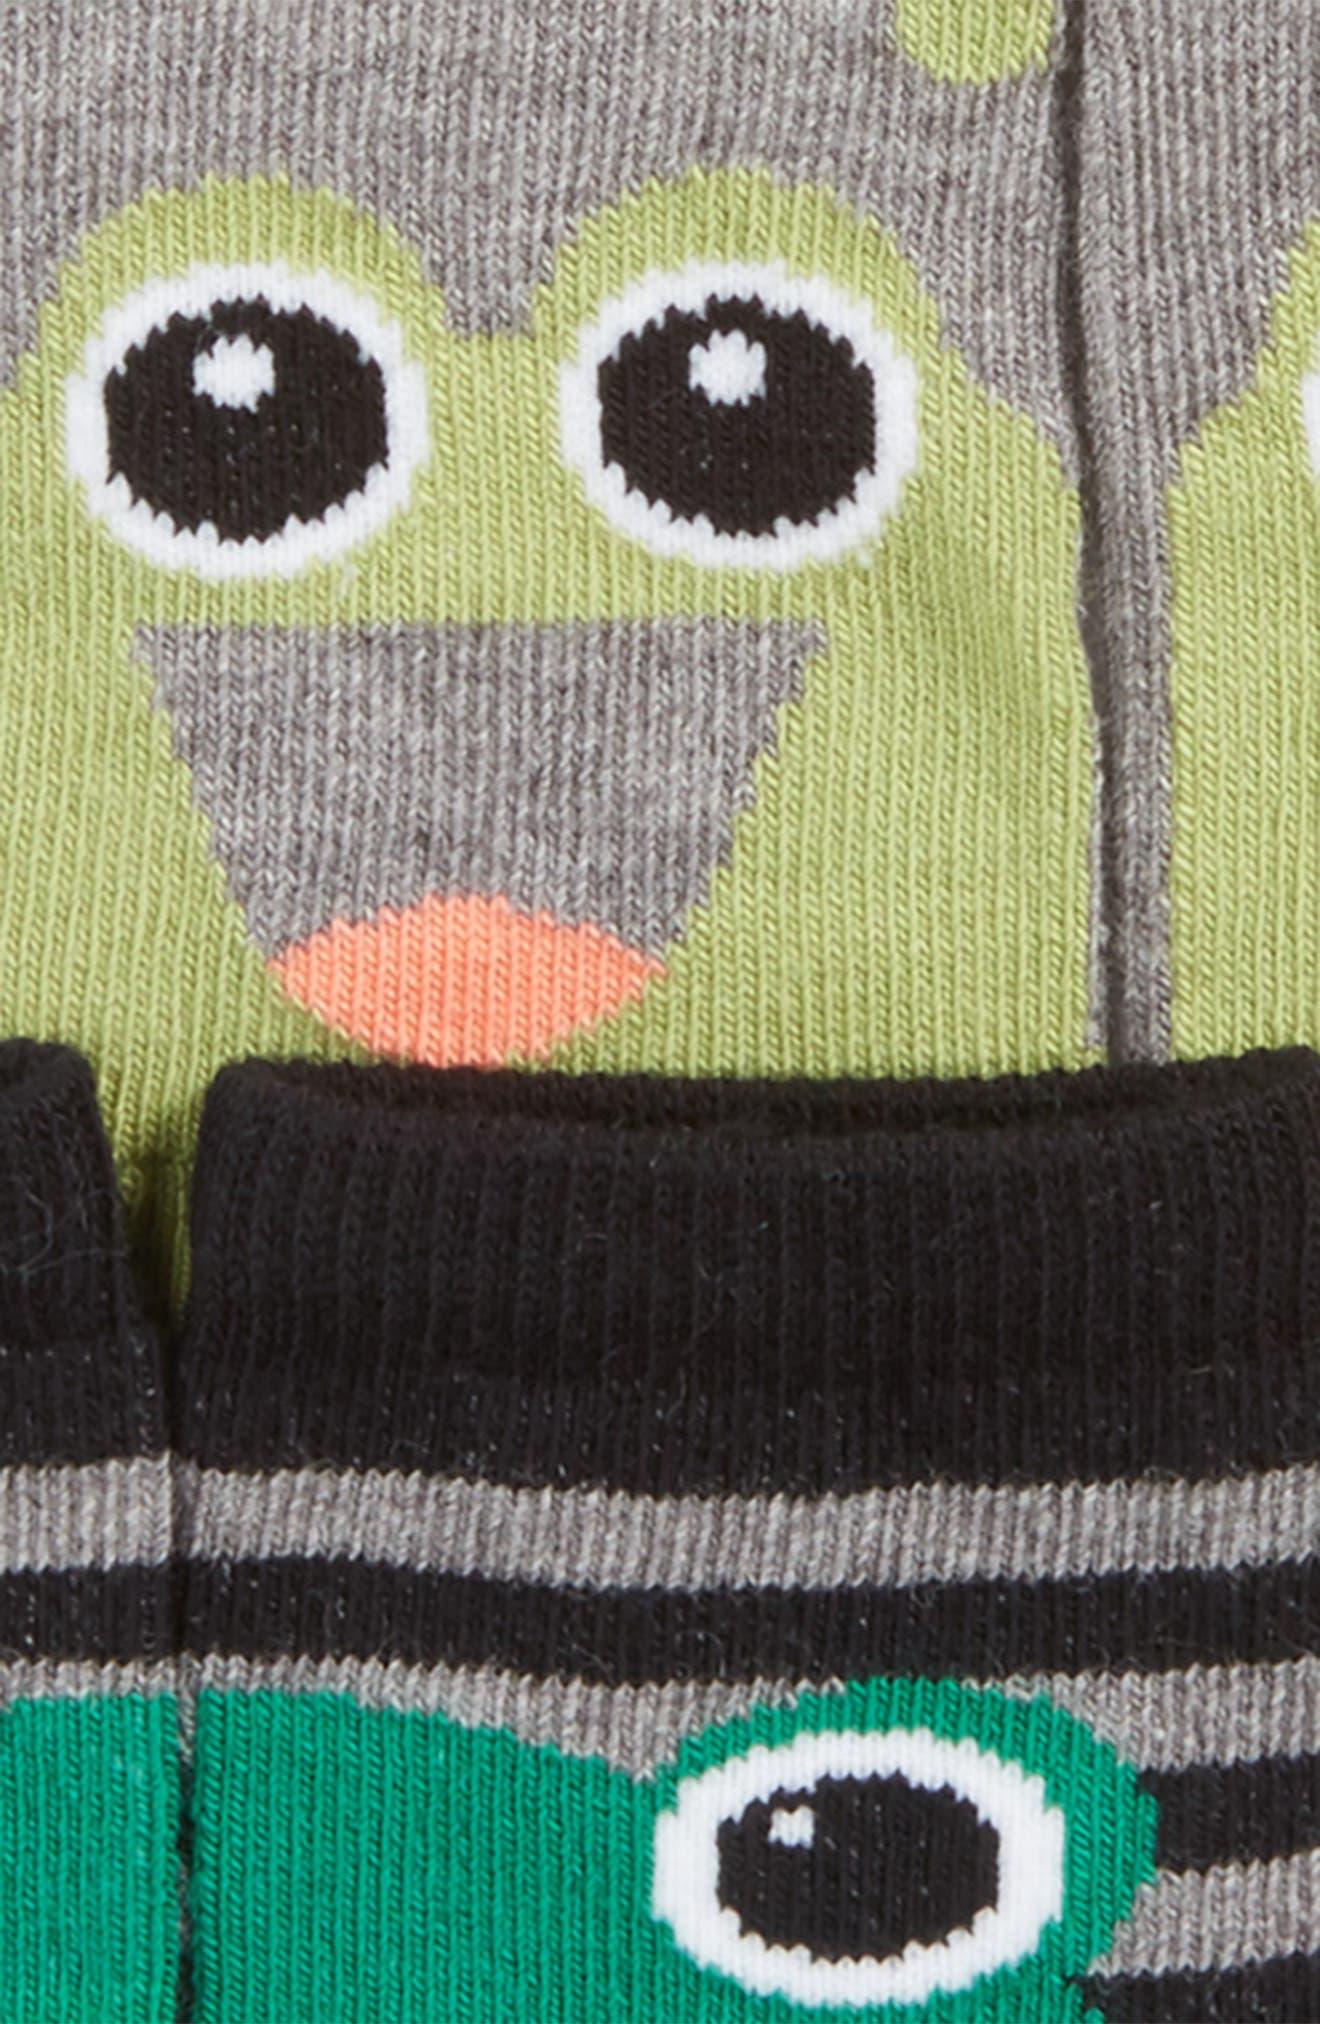 Assorted 3-Pack Frog Socks,                             Alternate thumbnail 2, color,                             300